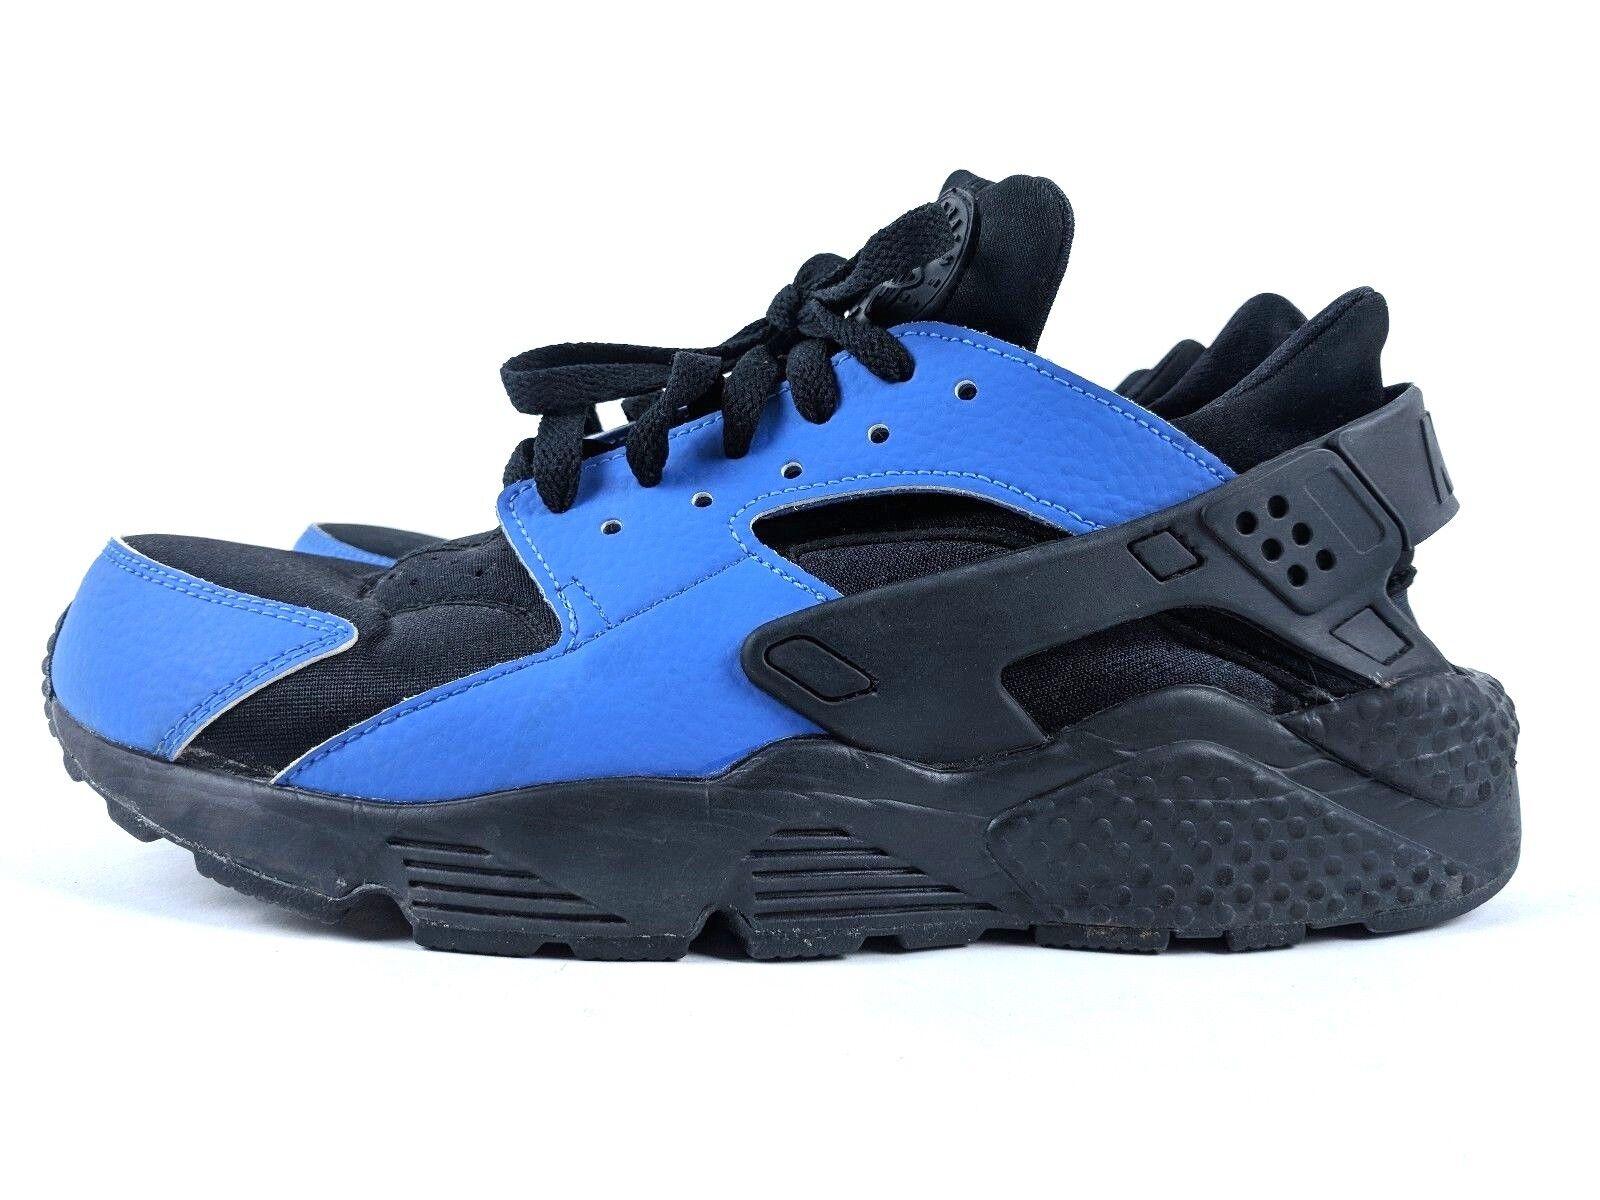 Nike Huarache iD Women's Black & Blue Nike iD Running Shoe, Sz 10 (777331-982)